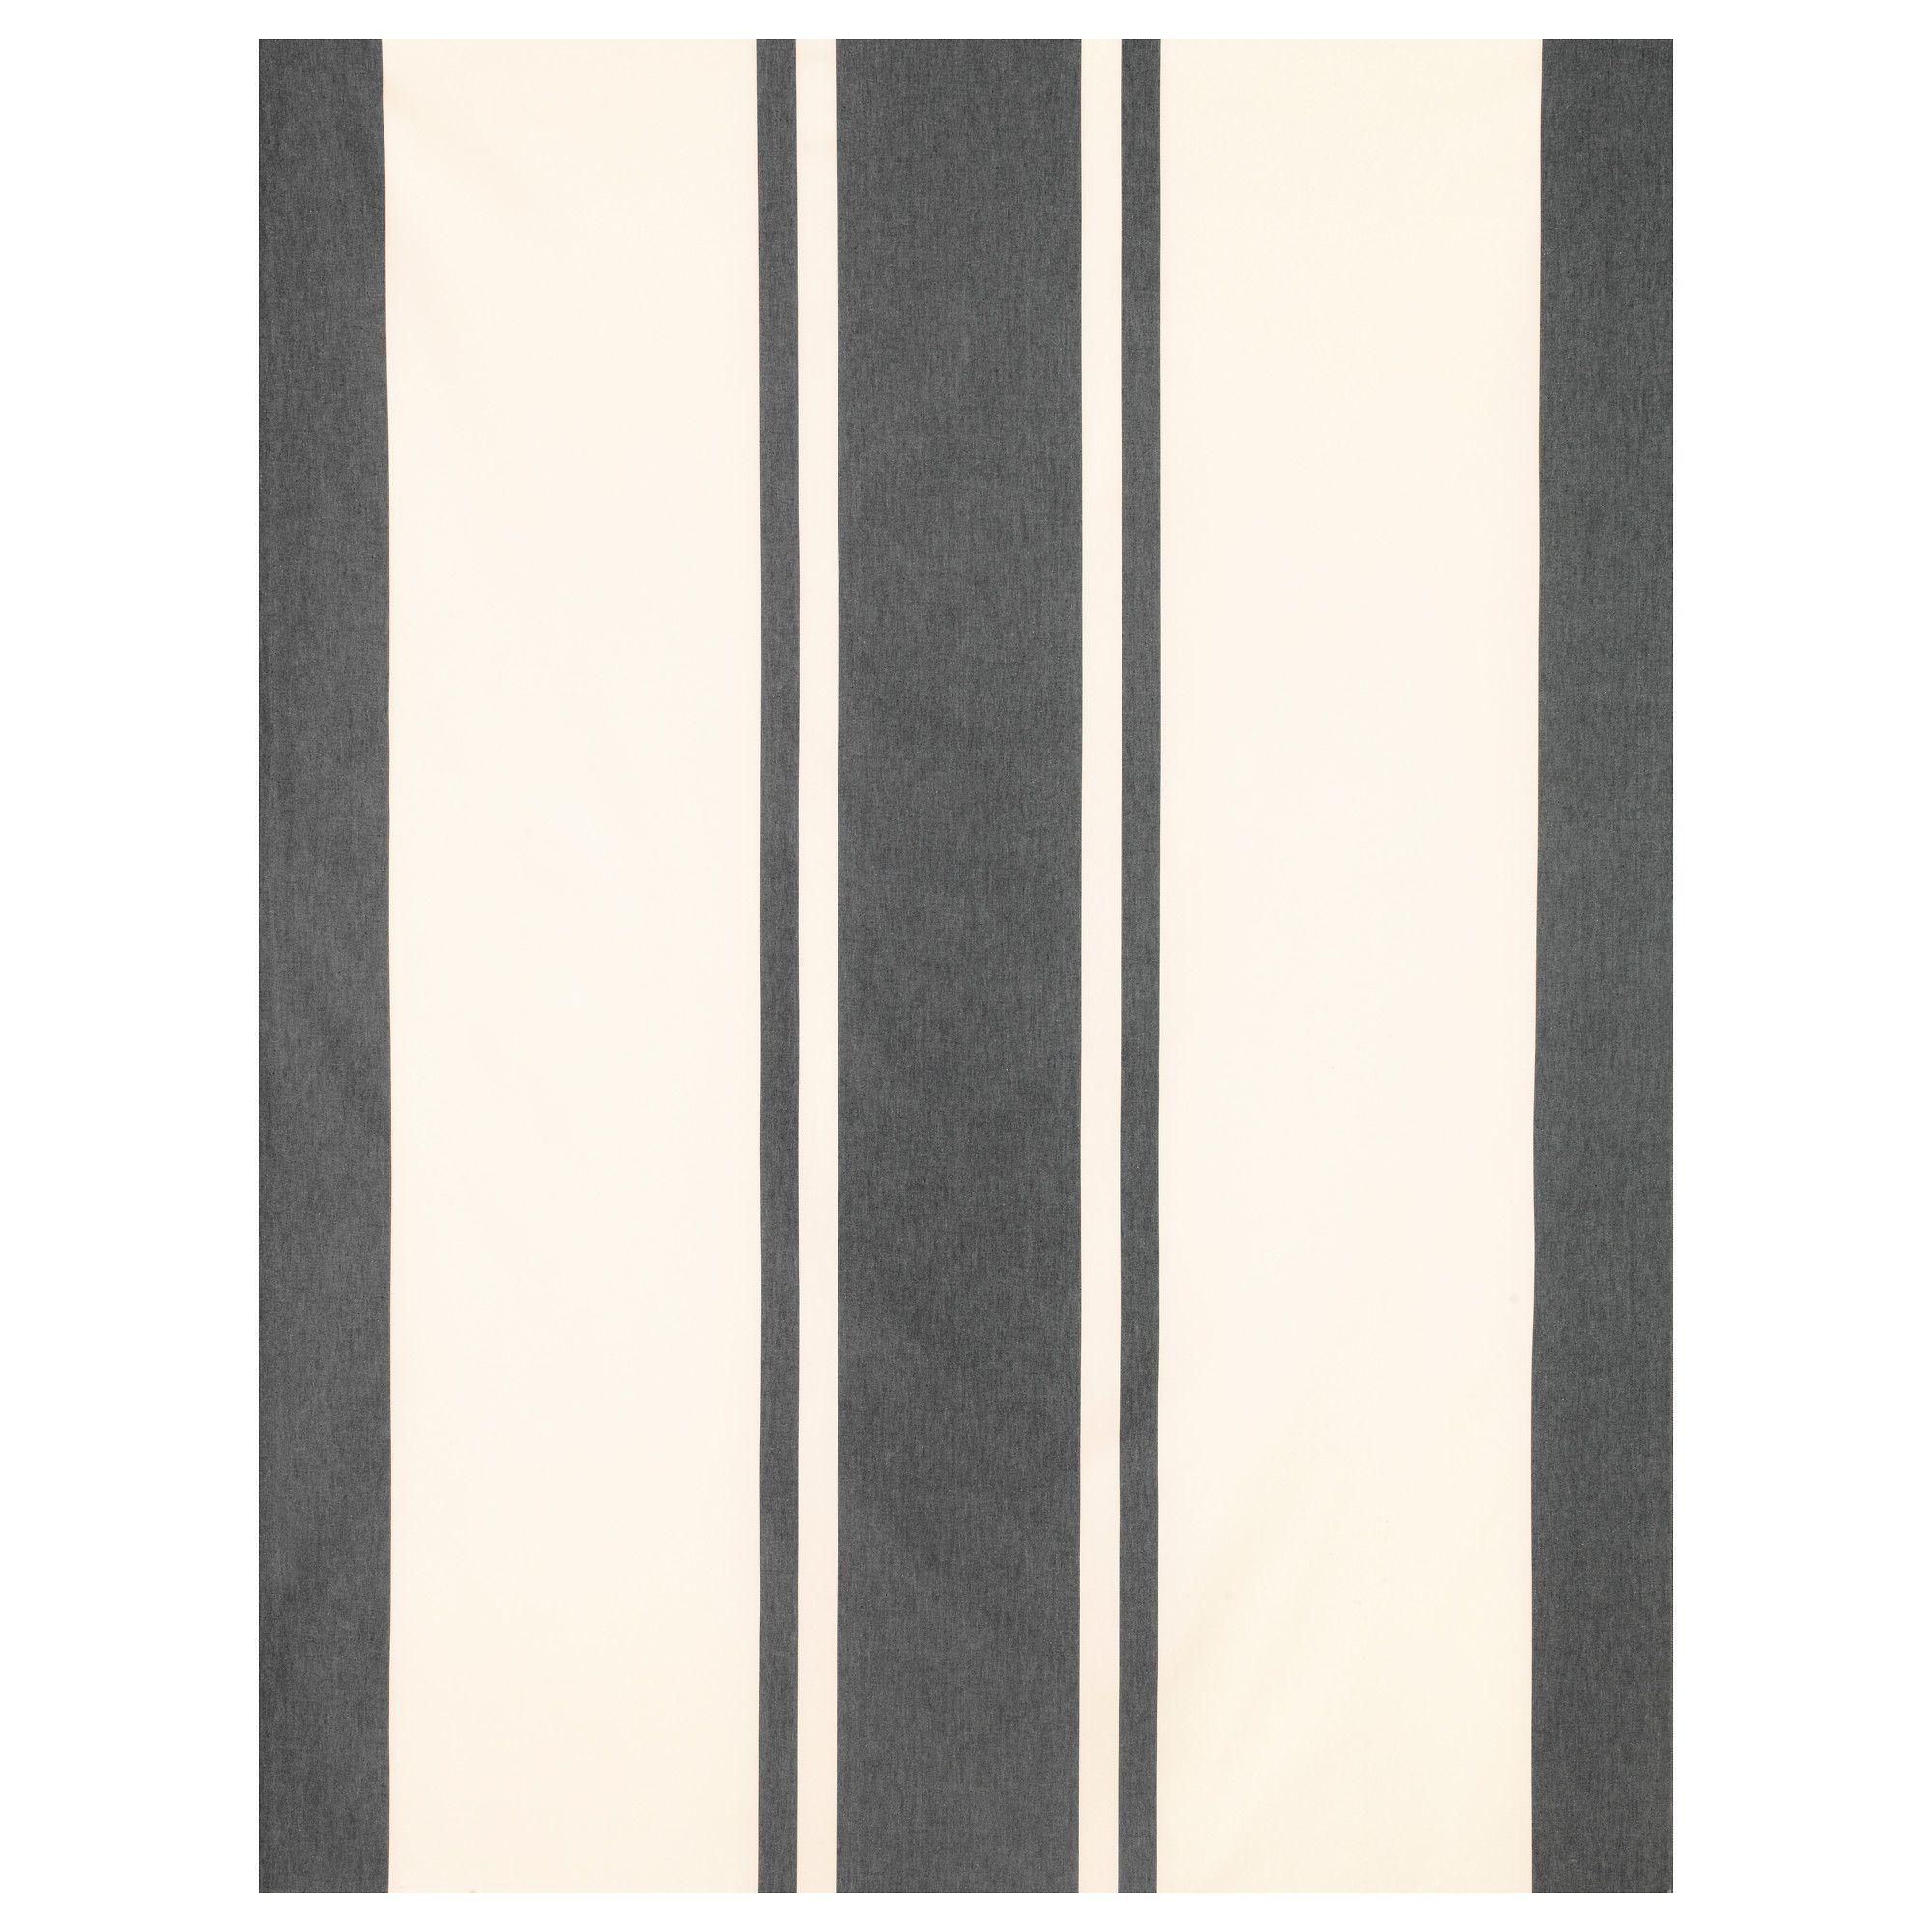 bj rnloka meterware wei grau ideas for the new apartment. Black Bedroom Furniture Sets. Home Design Ideas